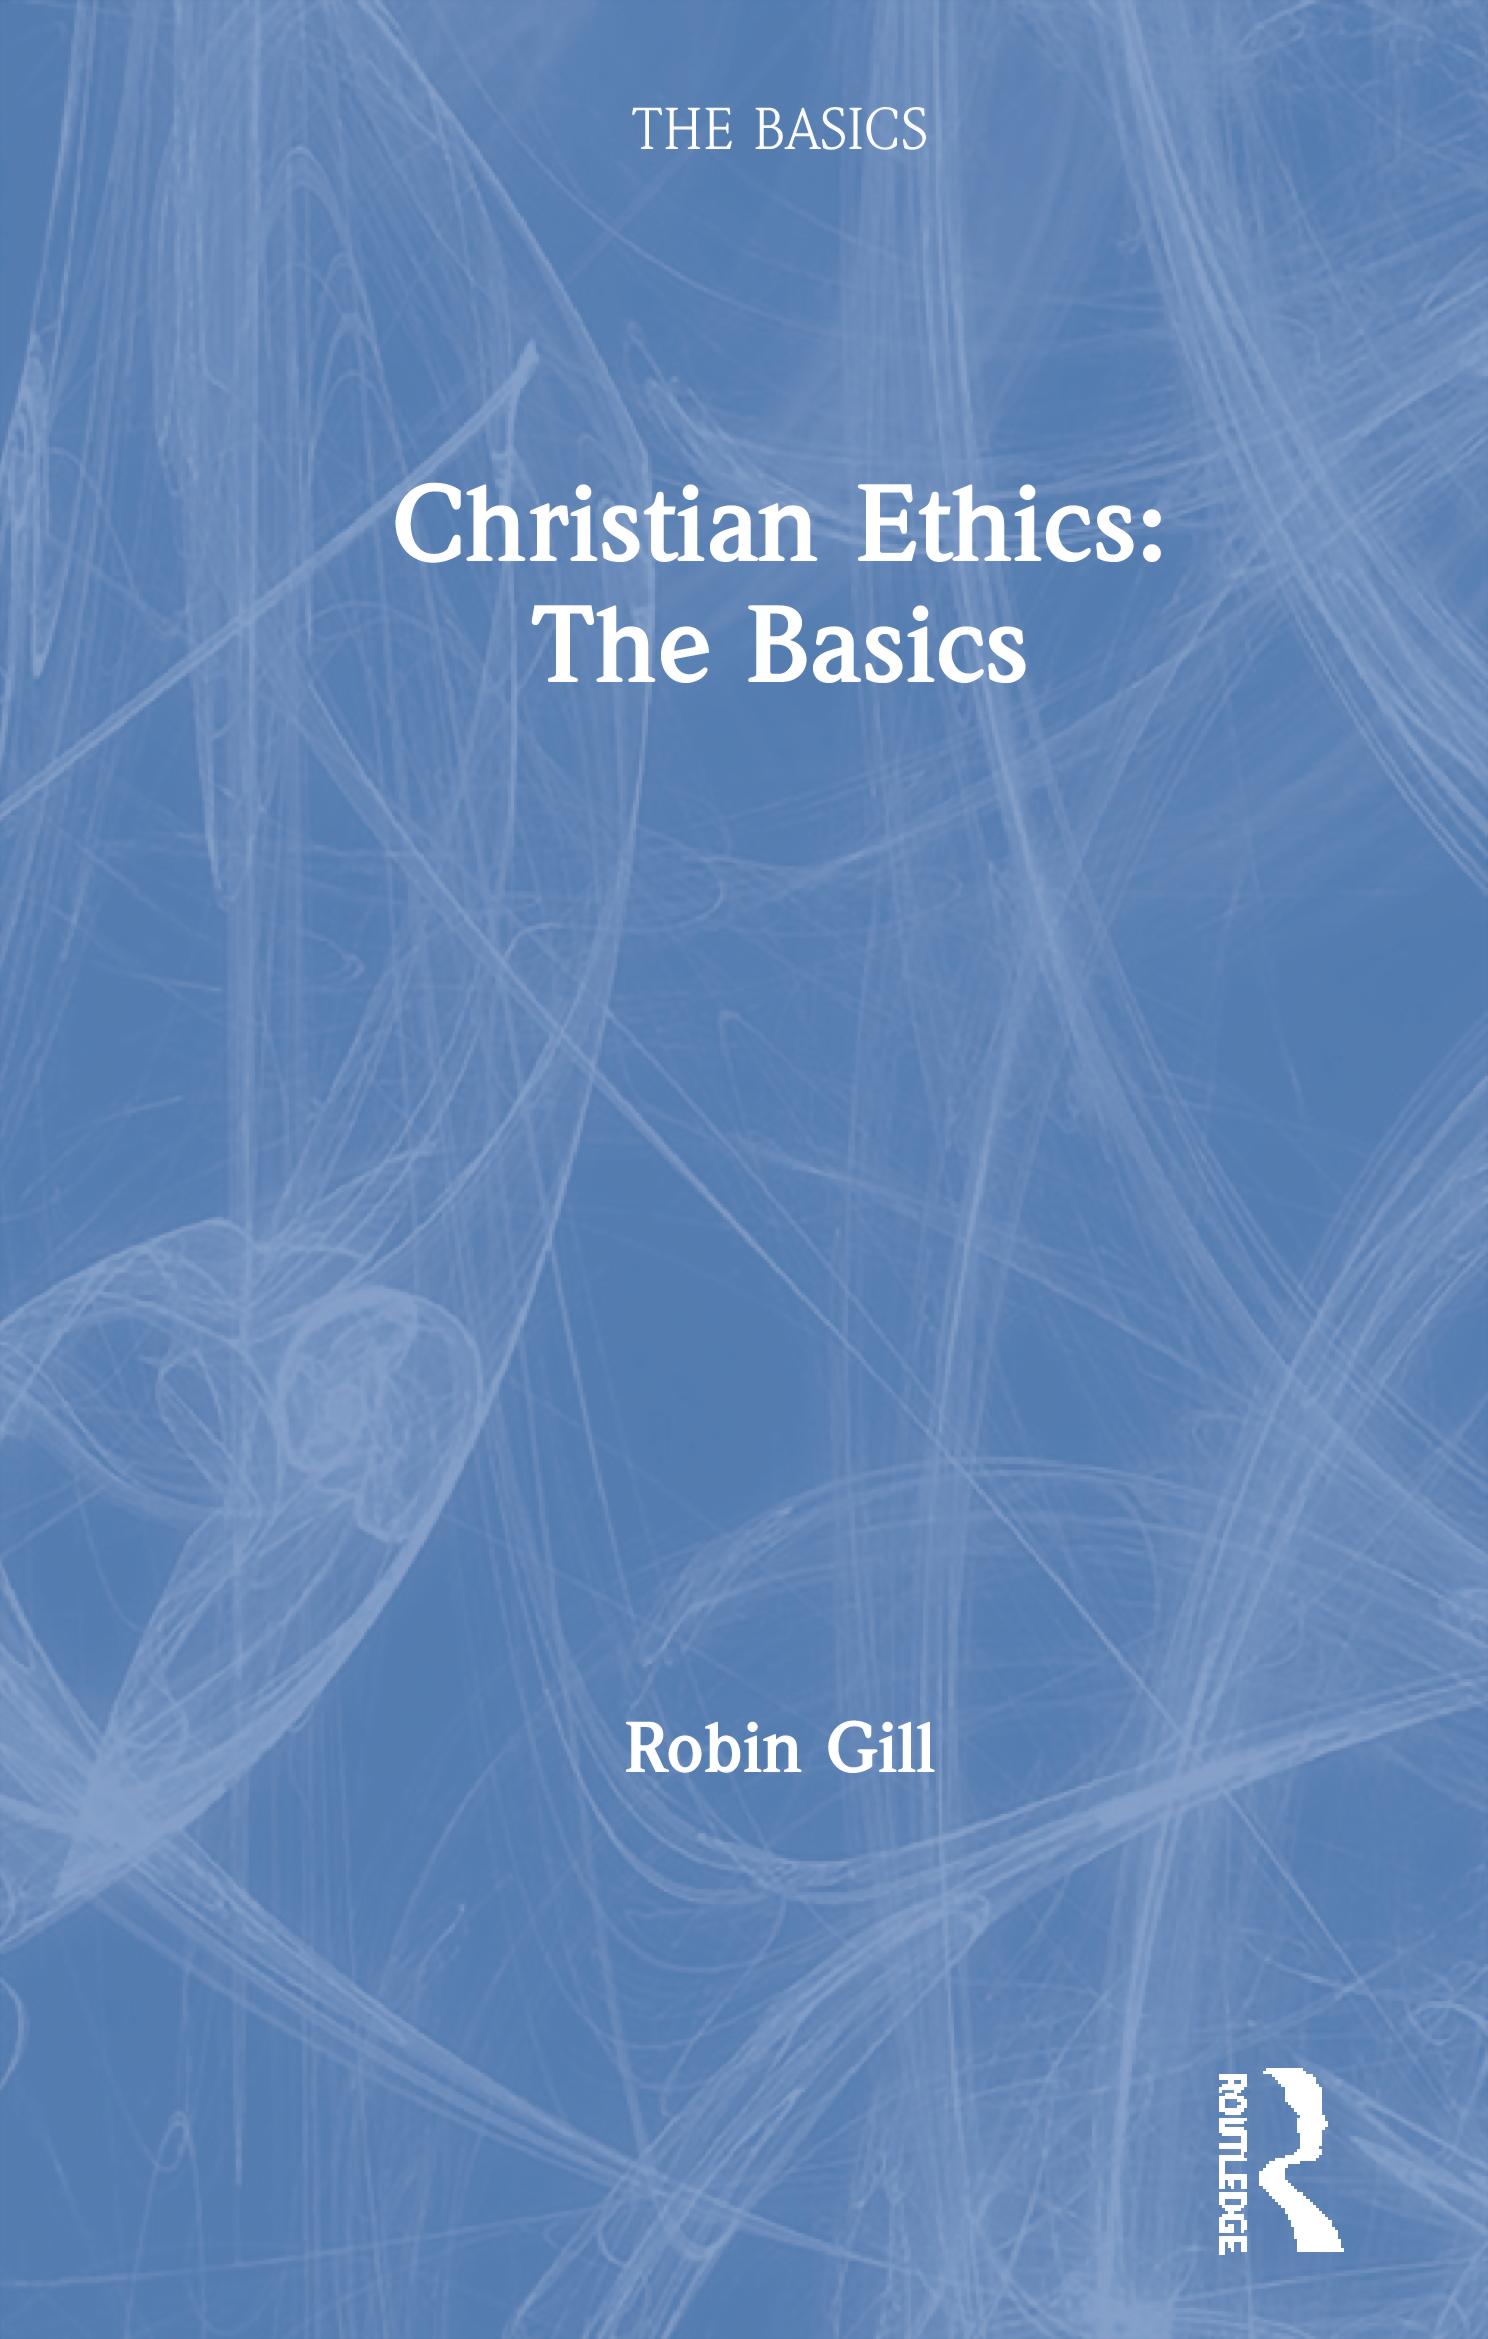 Christian Ethics: The Basics book cover